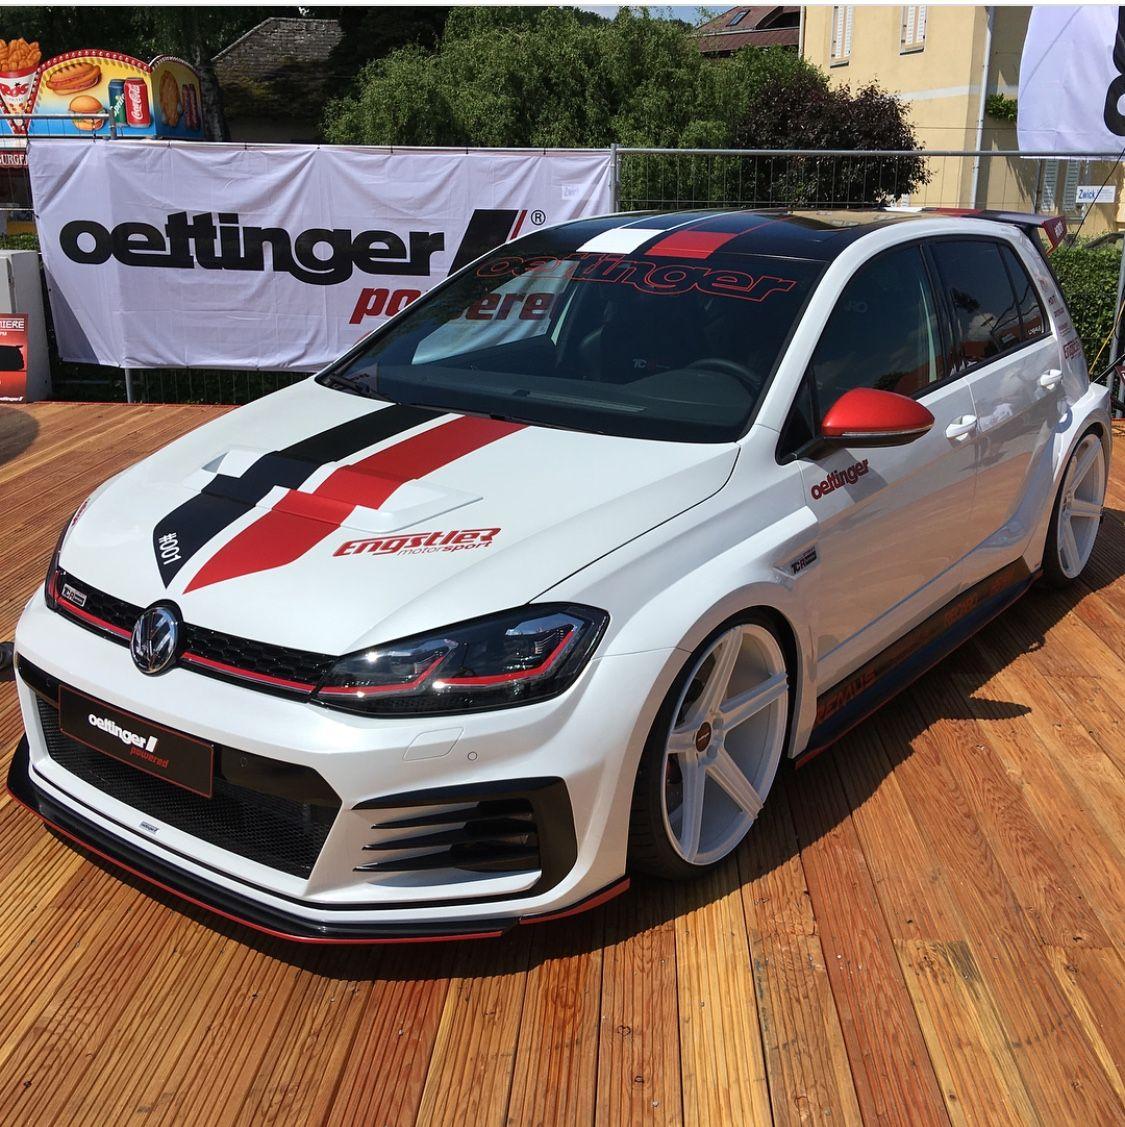 Oettinger Golf Tcr Gti Mk7 Volkswagen Golf Gti Vw Golf